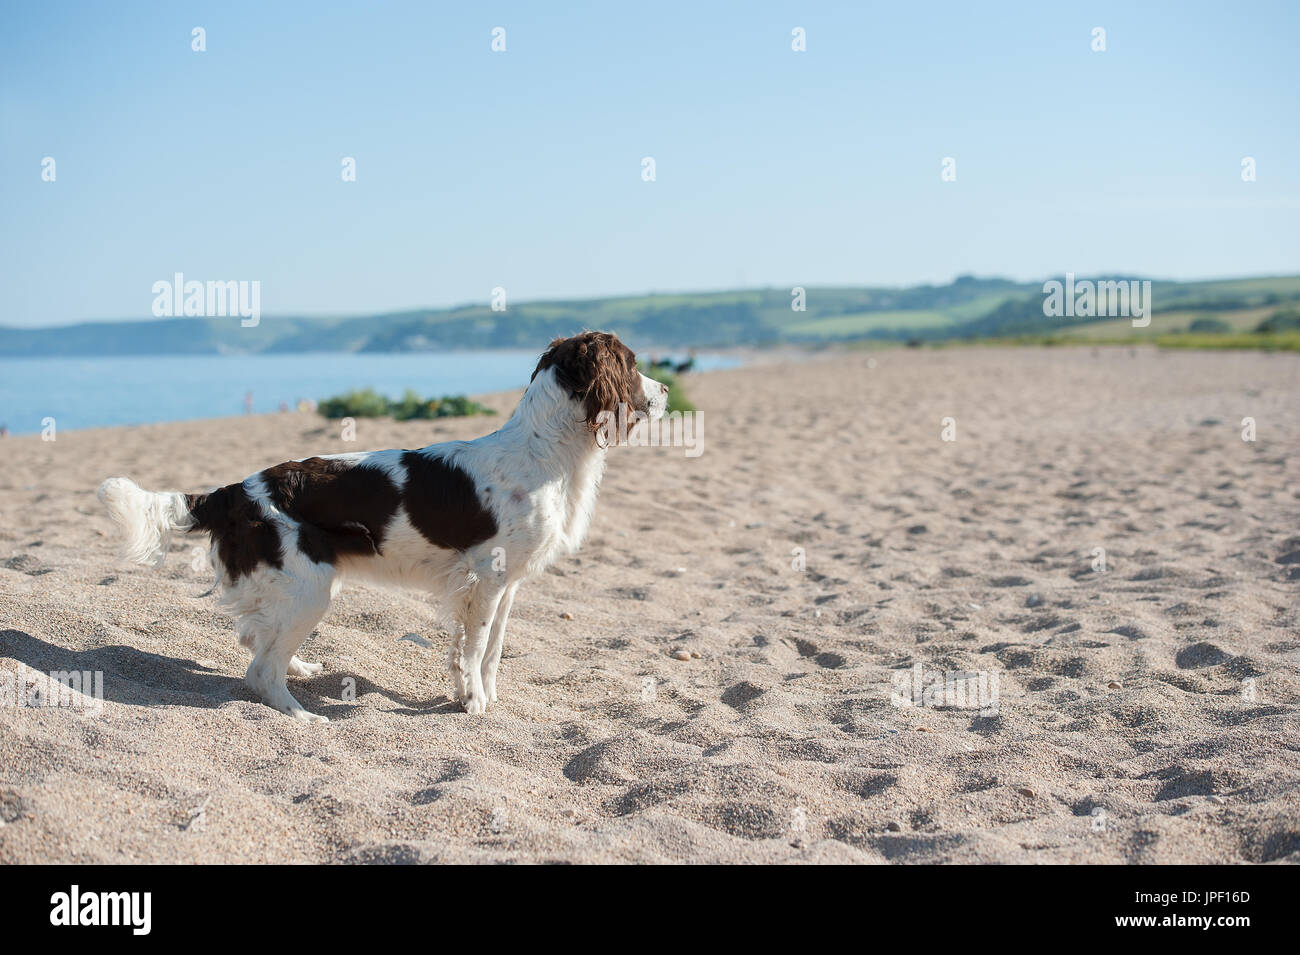 Springer spaniel standing on a beach - Stock Image